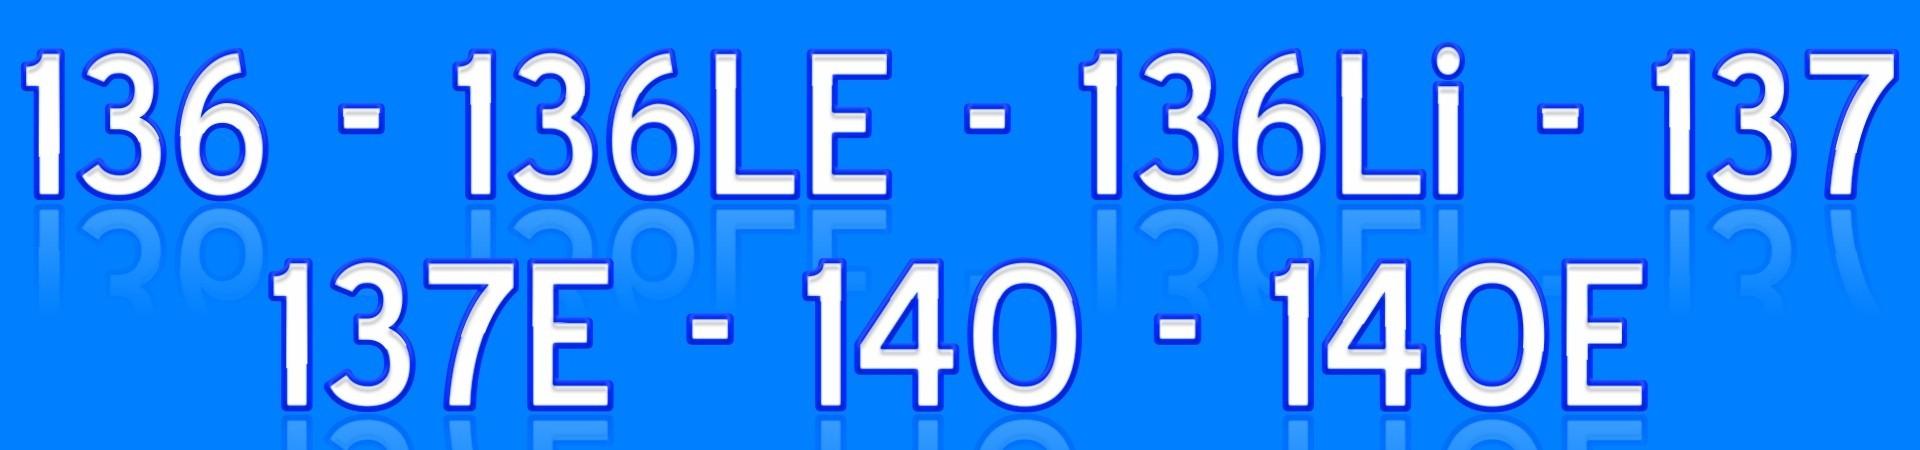 136 137 141 142